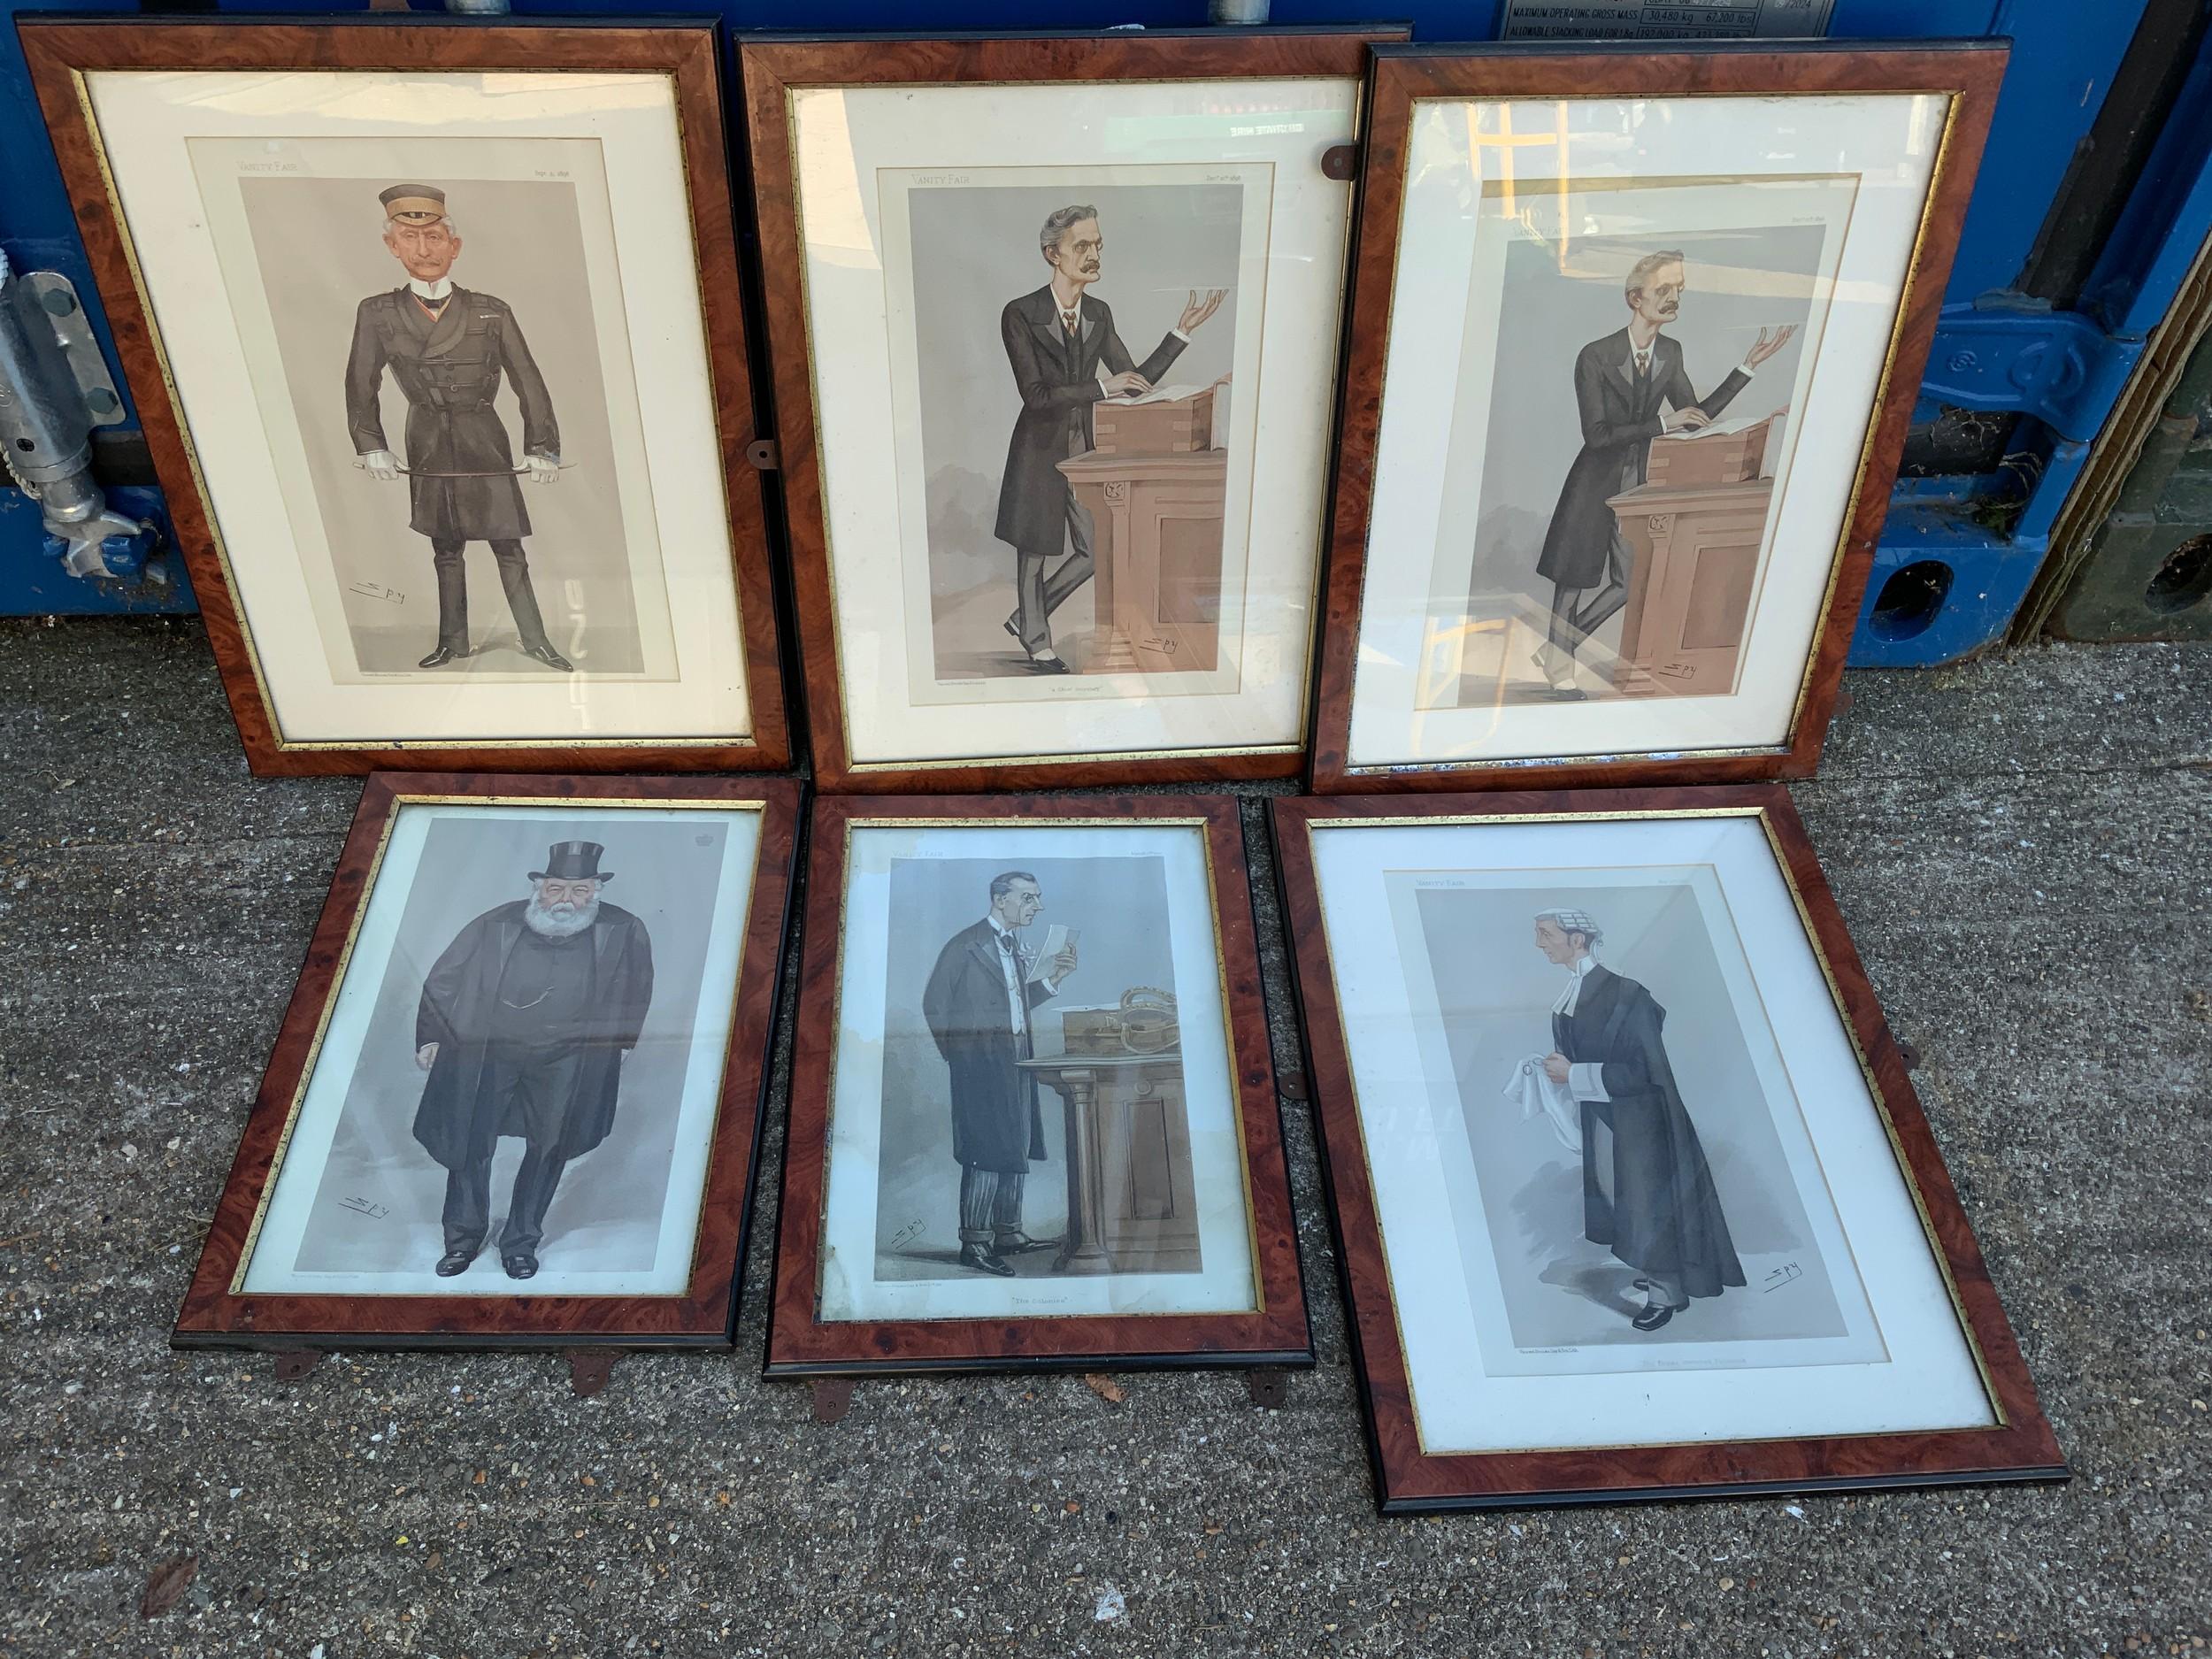 Framed Vanity Fair Prints